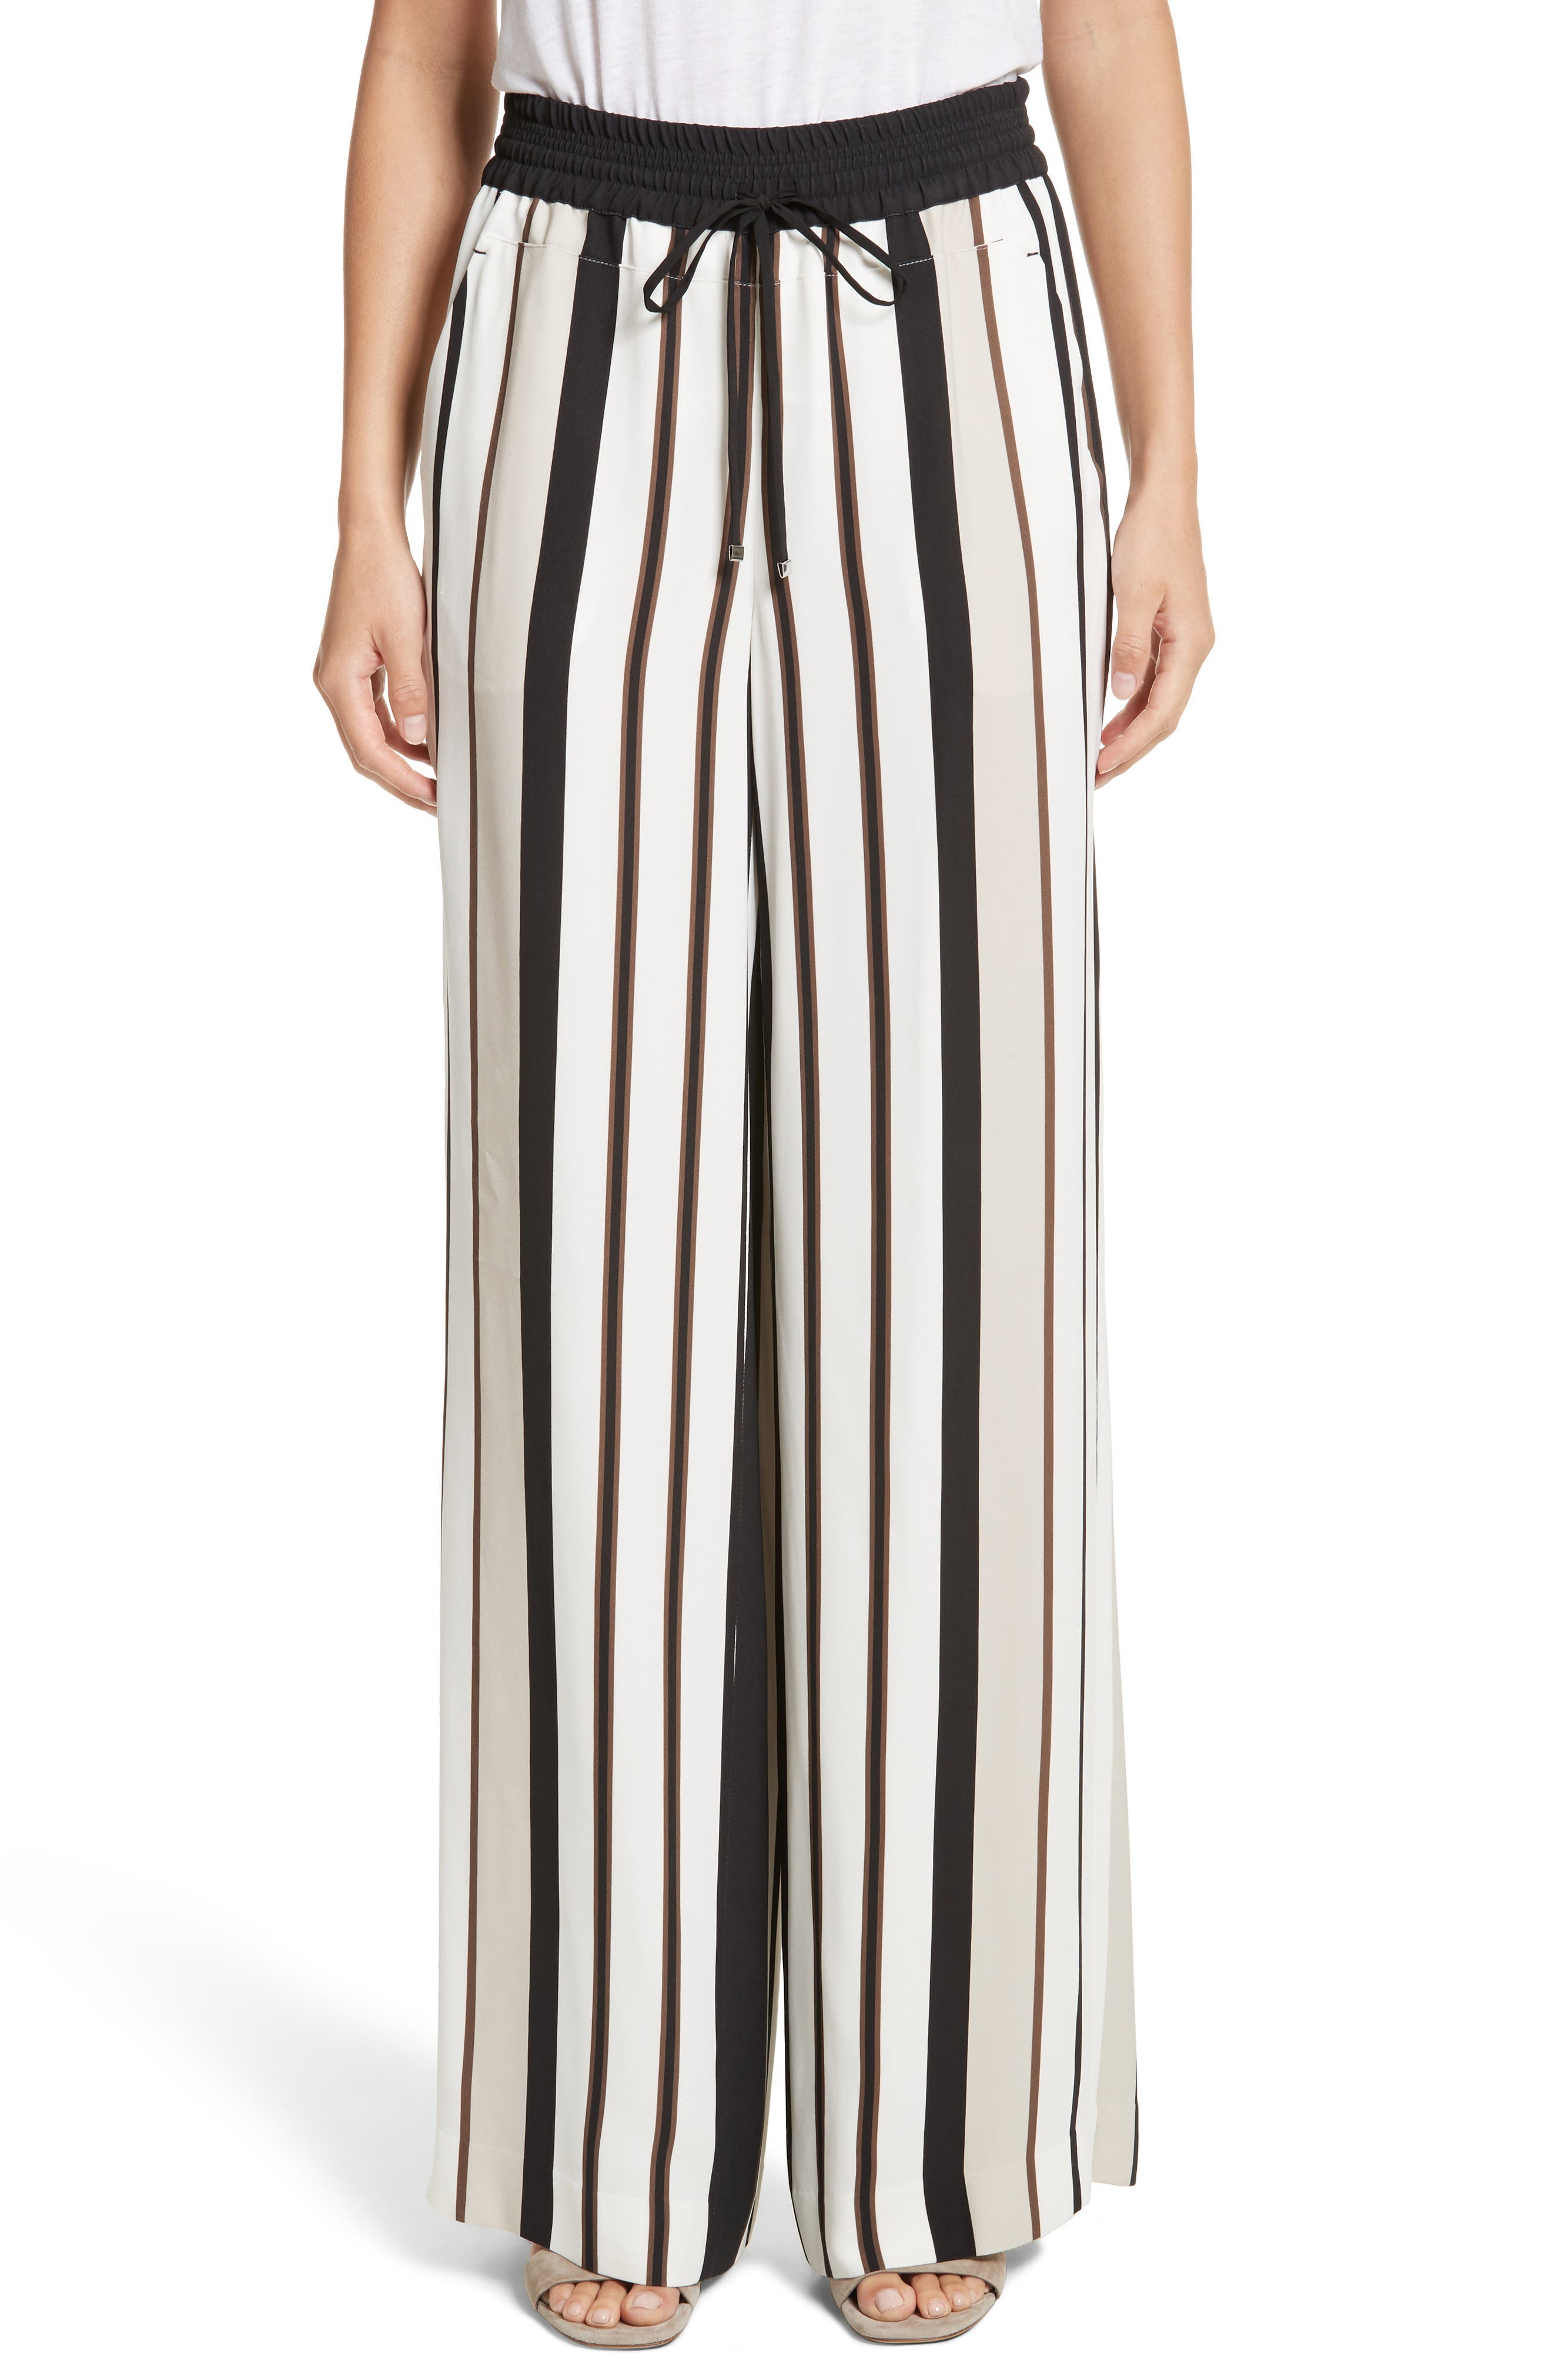 Allen Legacy Stripe Drape Cloth Pants,                         Main,                         color, Black Multi